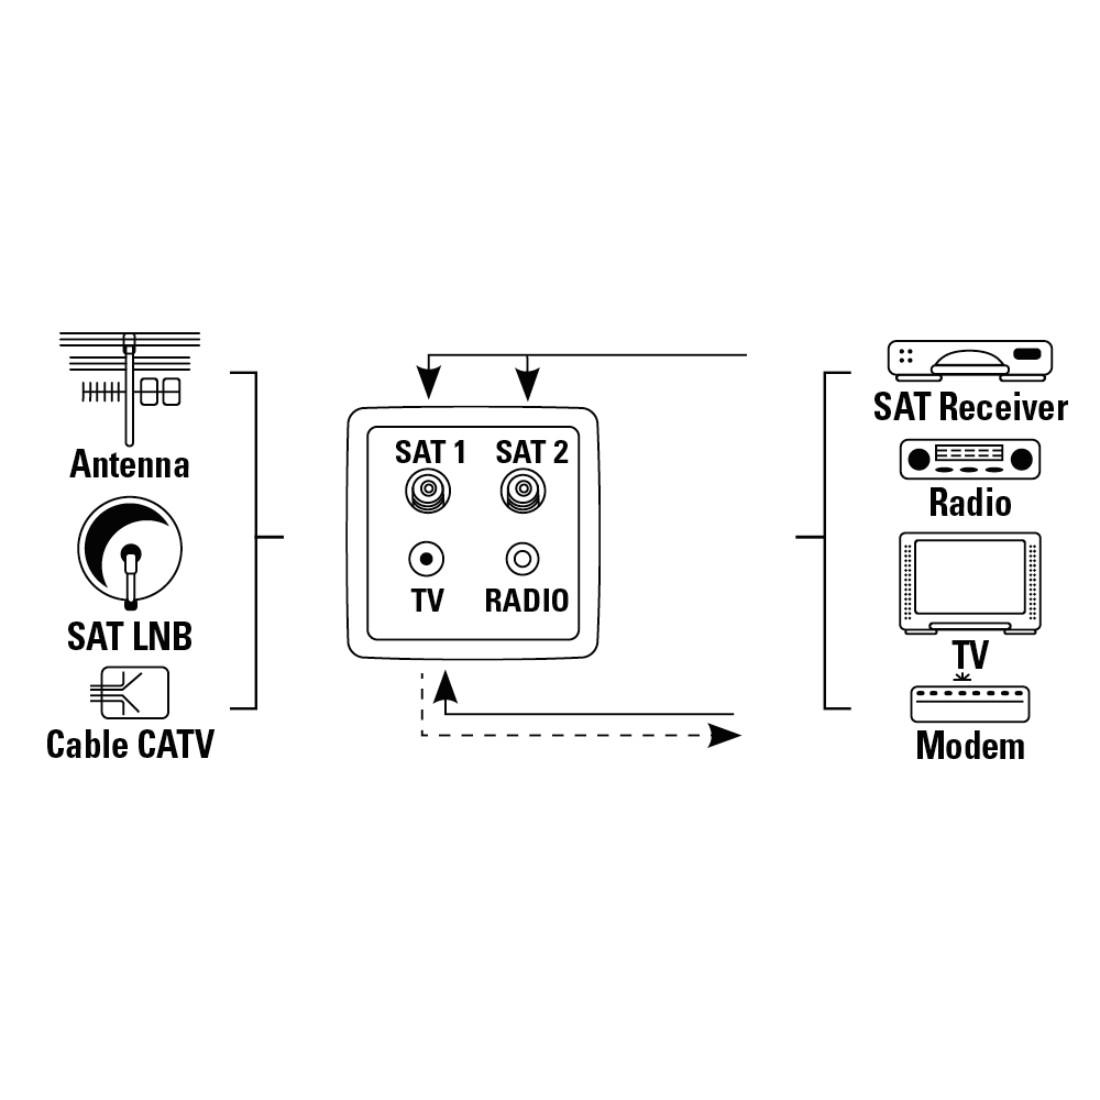 Relativ 00044257 Hama Antennen-/SAT-/BK-Dose, Twin-Enddose, Reinweiß   Hama DE KQ01